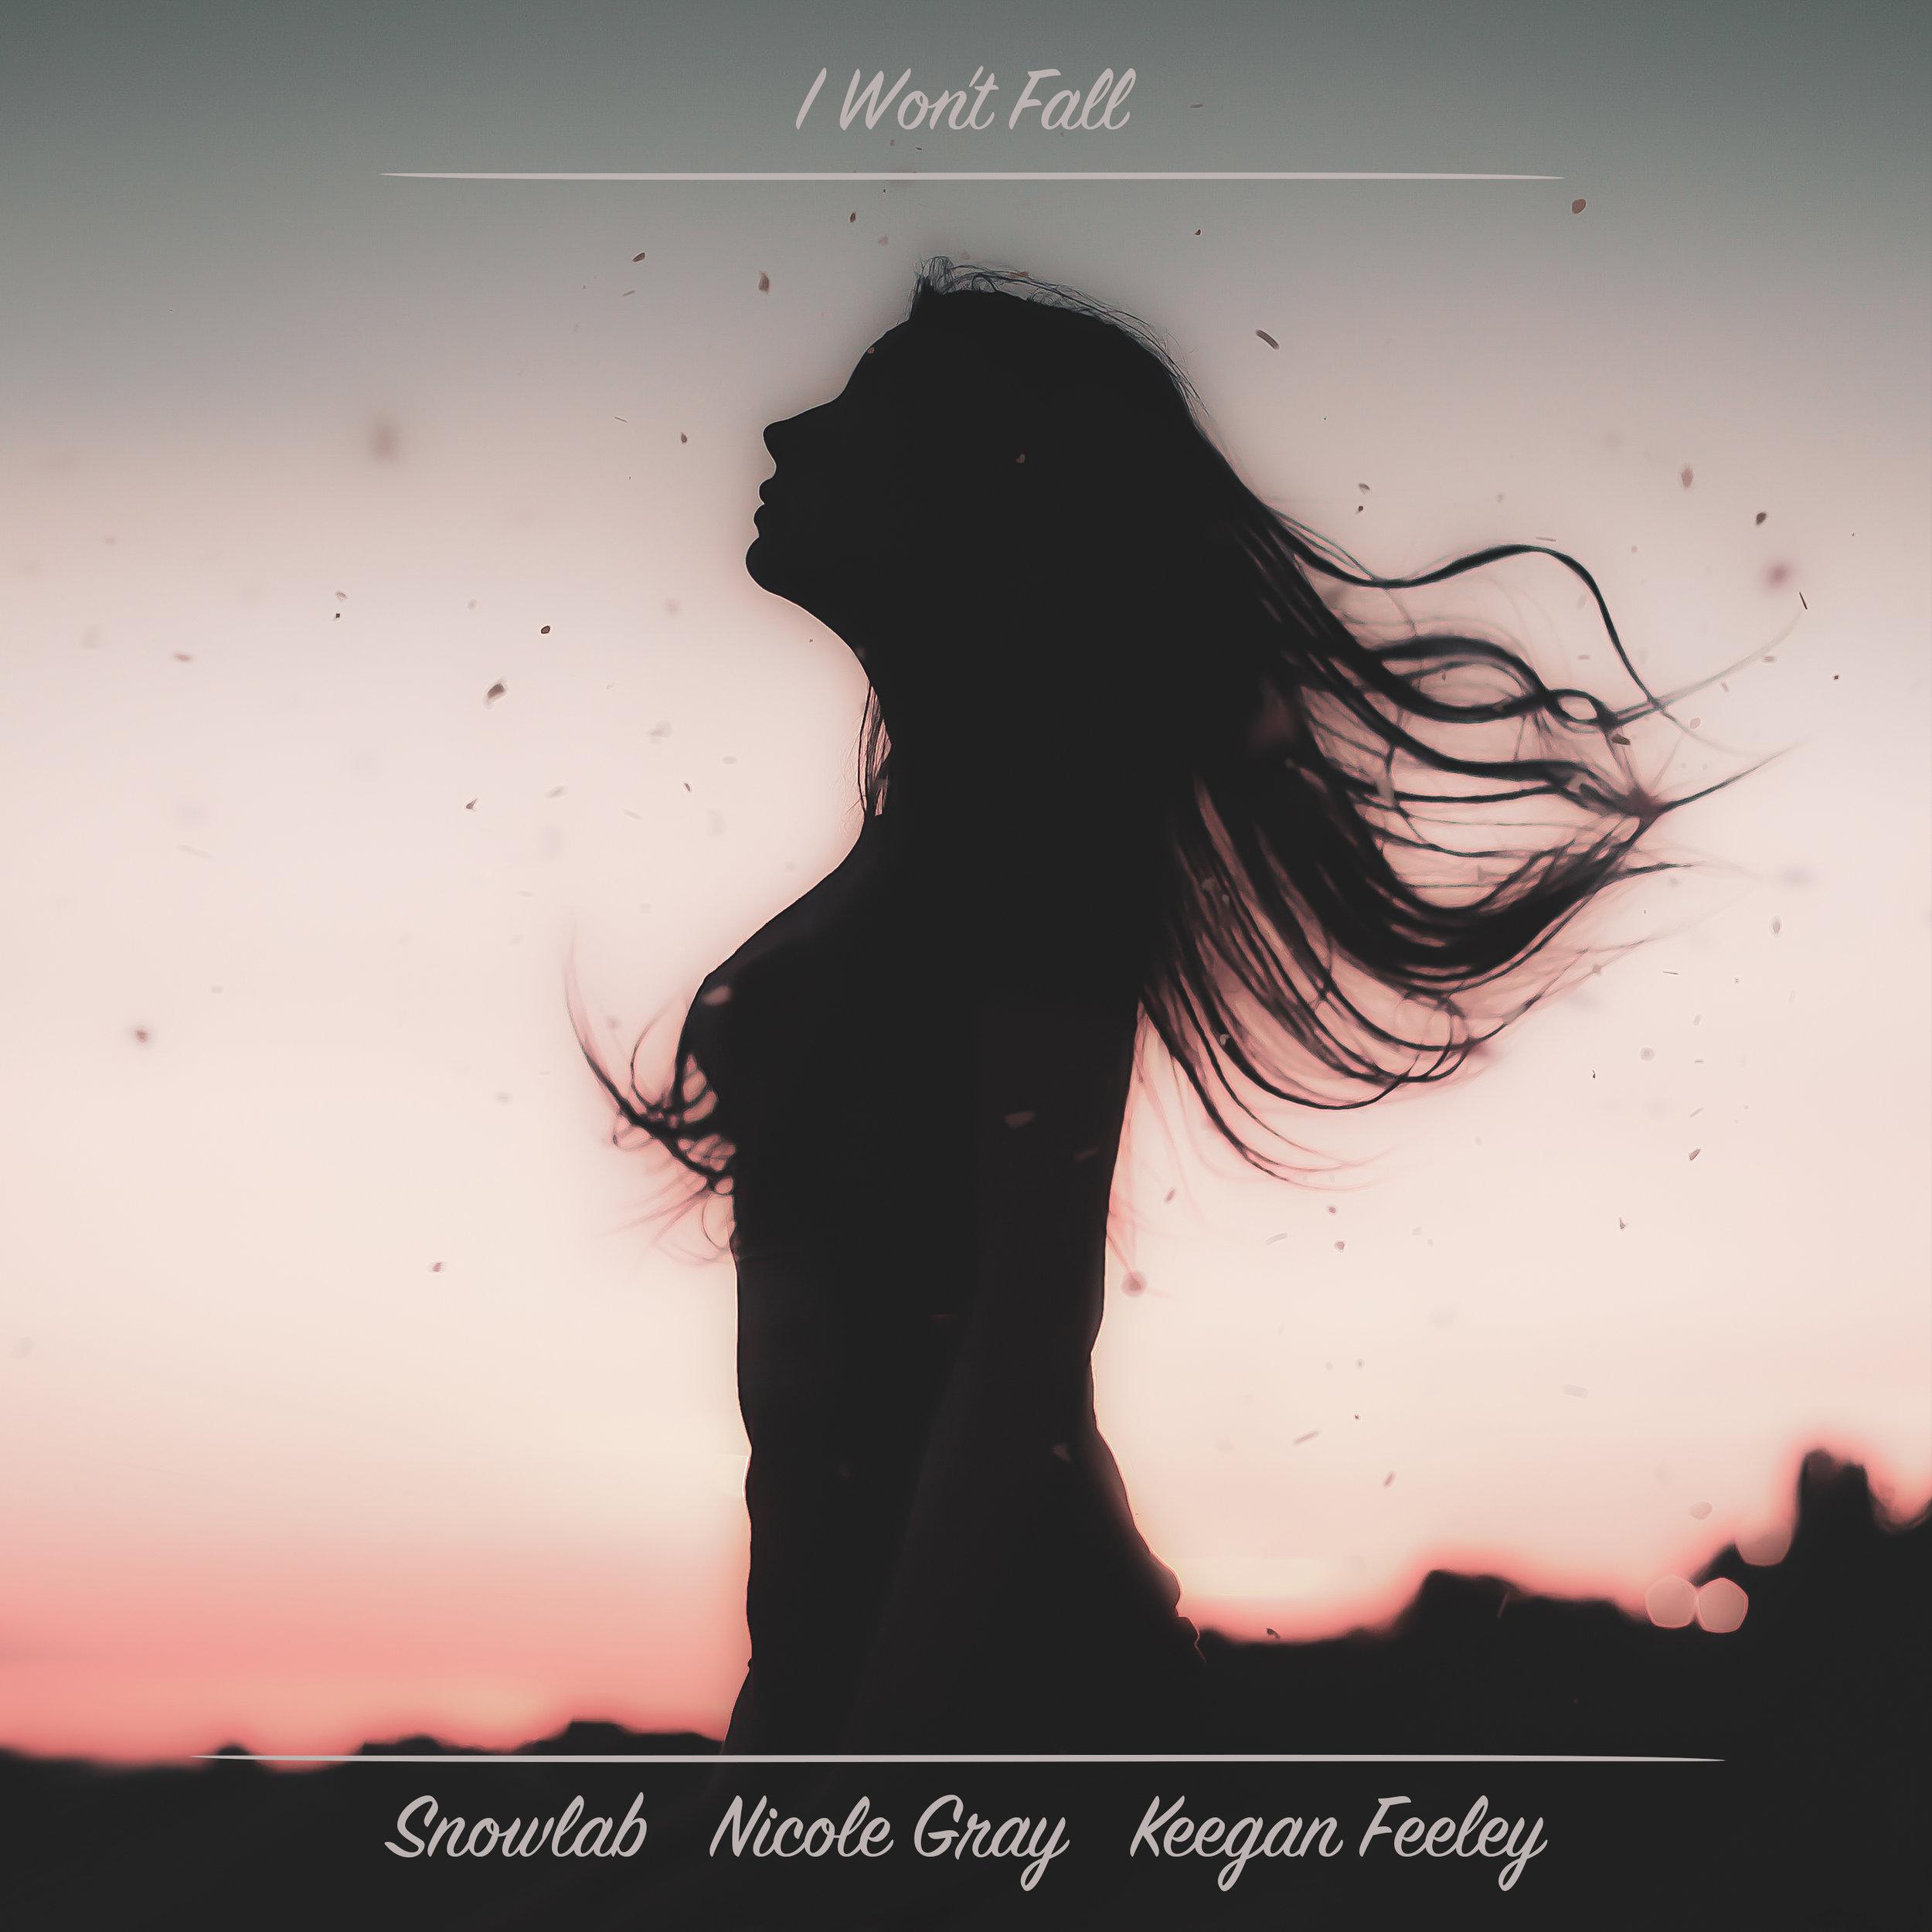 SNOWLAB - I WON'T FALL (FT. NICOLE GRAY X KEEGAN FEELEY)